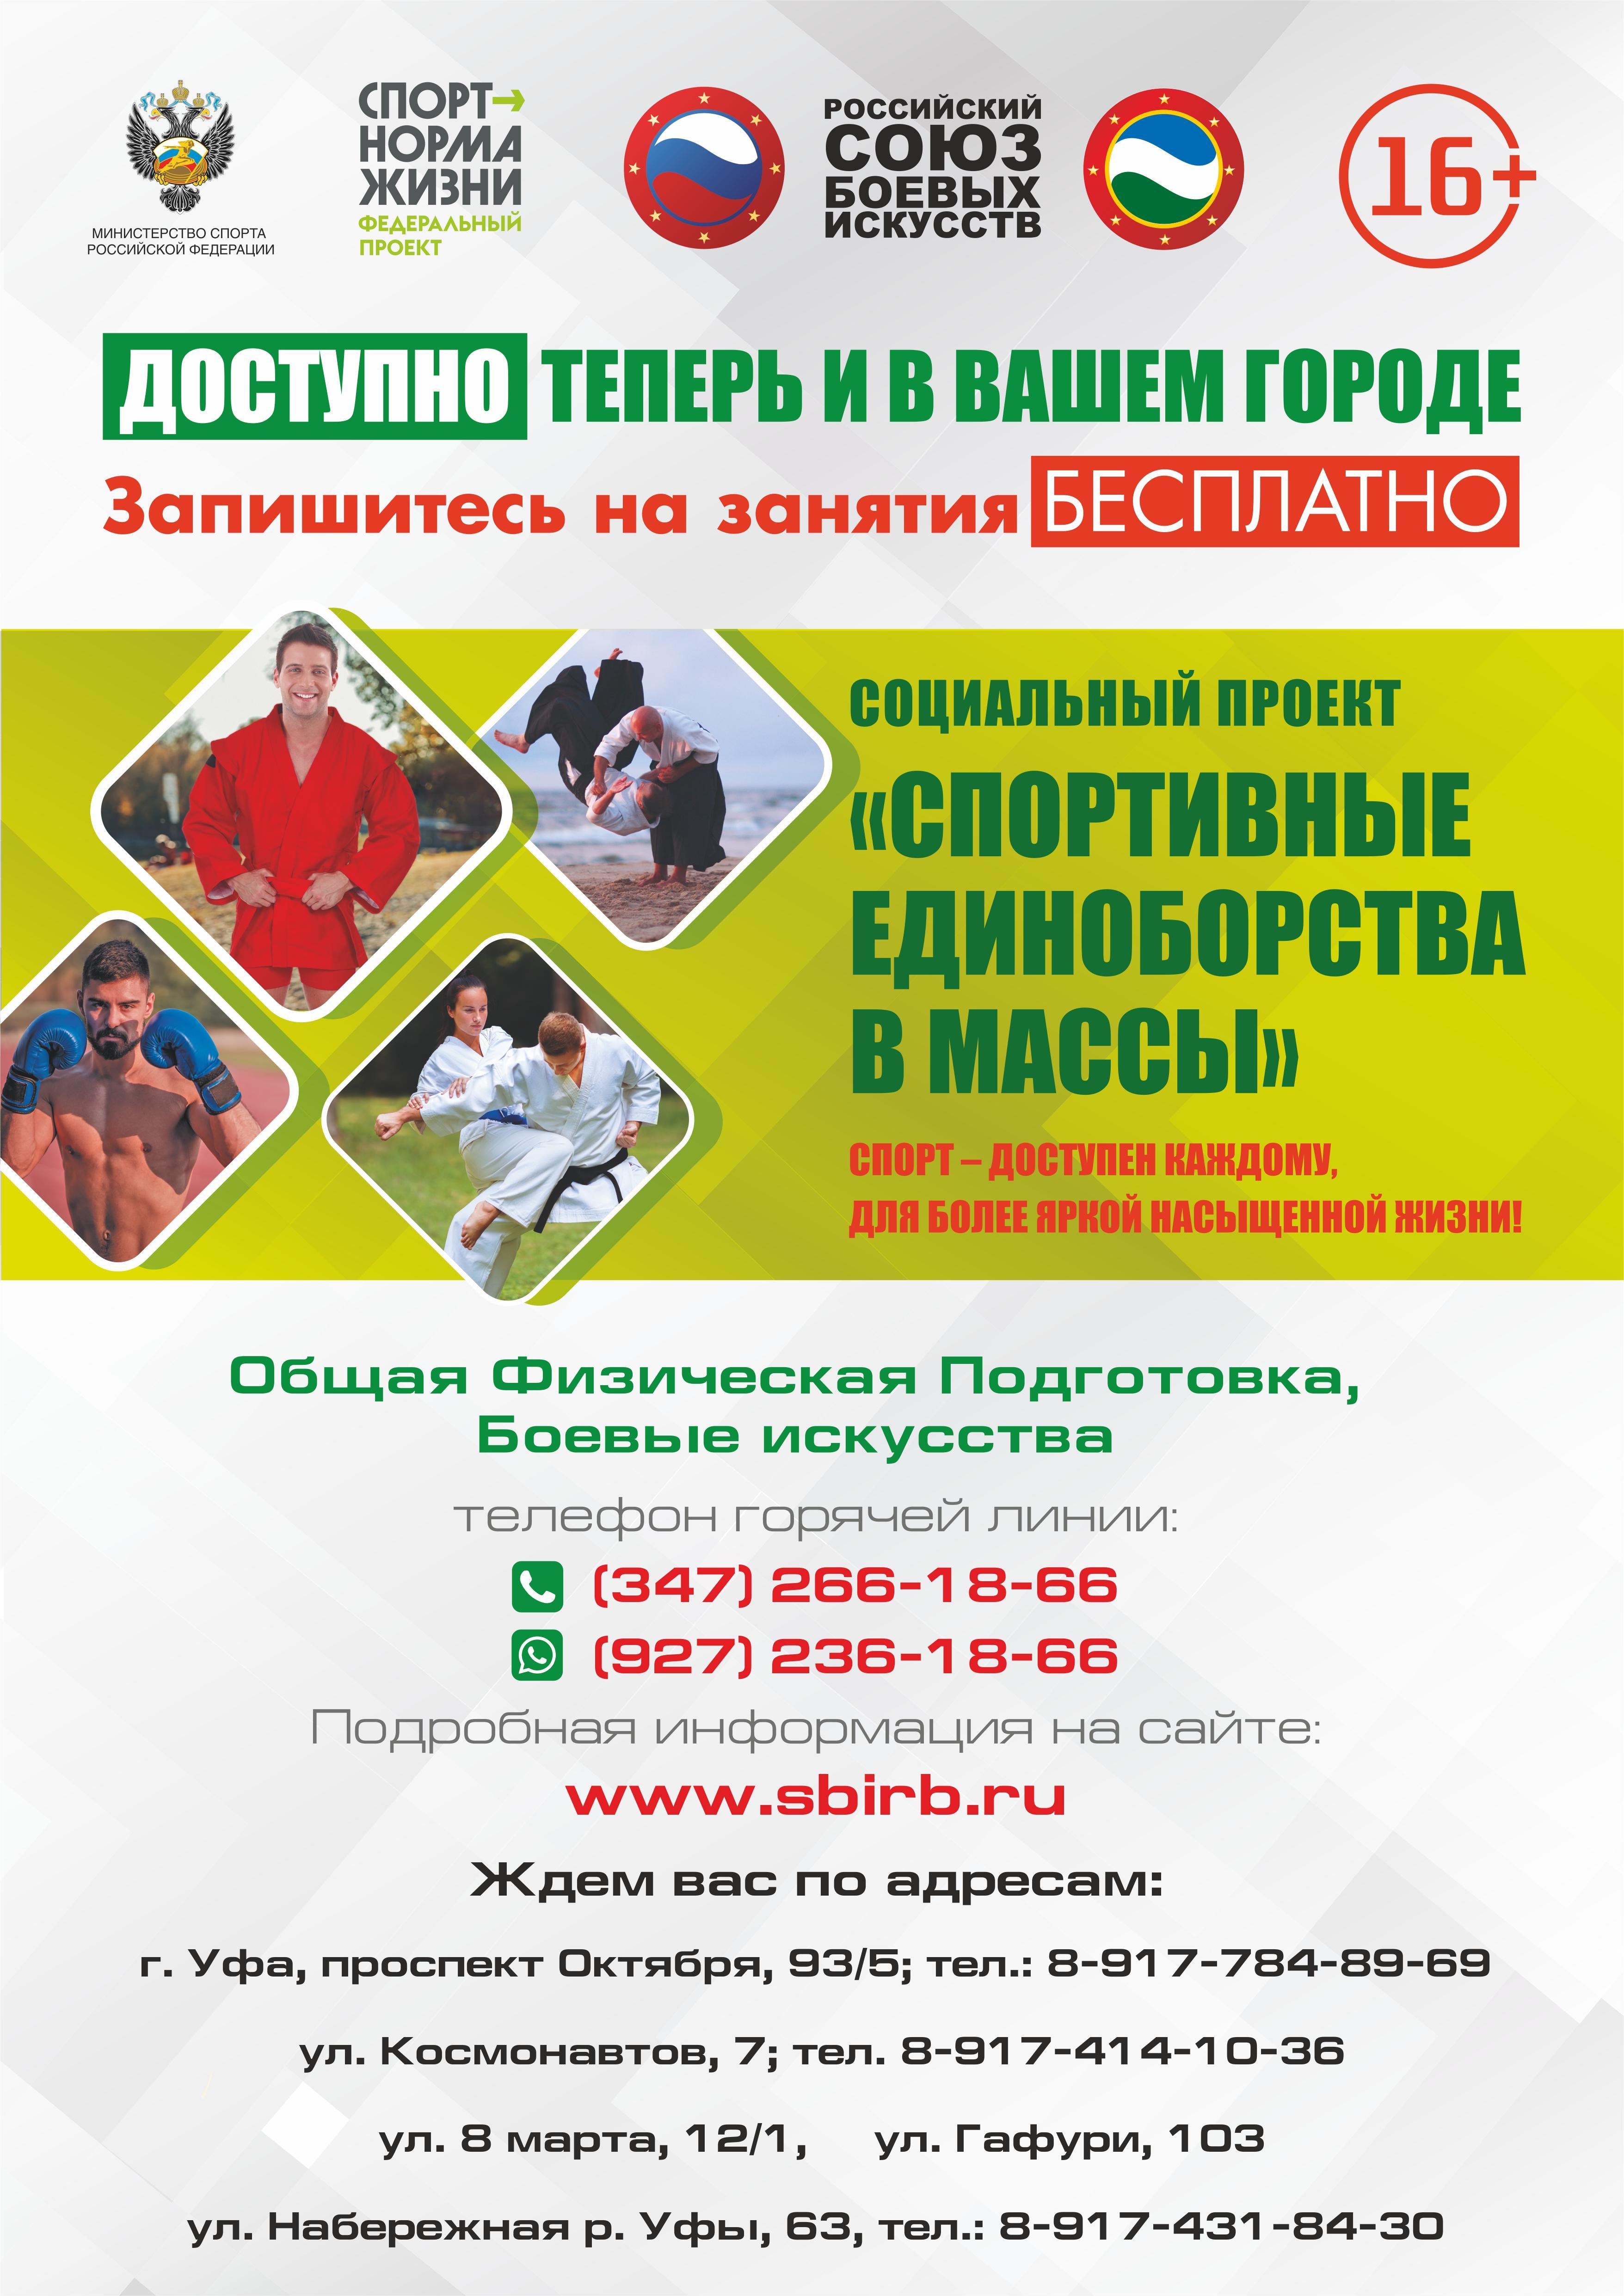 http://sbirb.combatsd.ru/images/upload/Афиша-%20клубы%20(Респ.Башкортостан).jpg